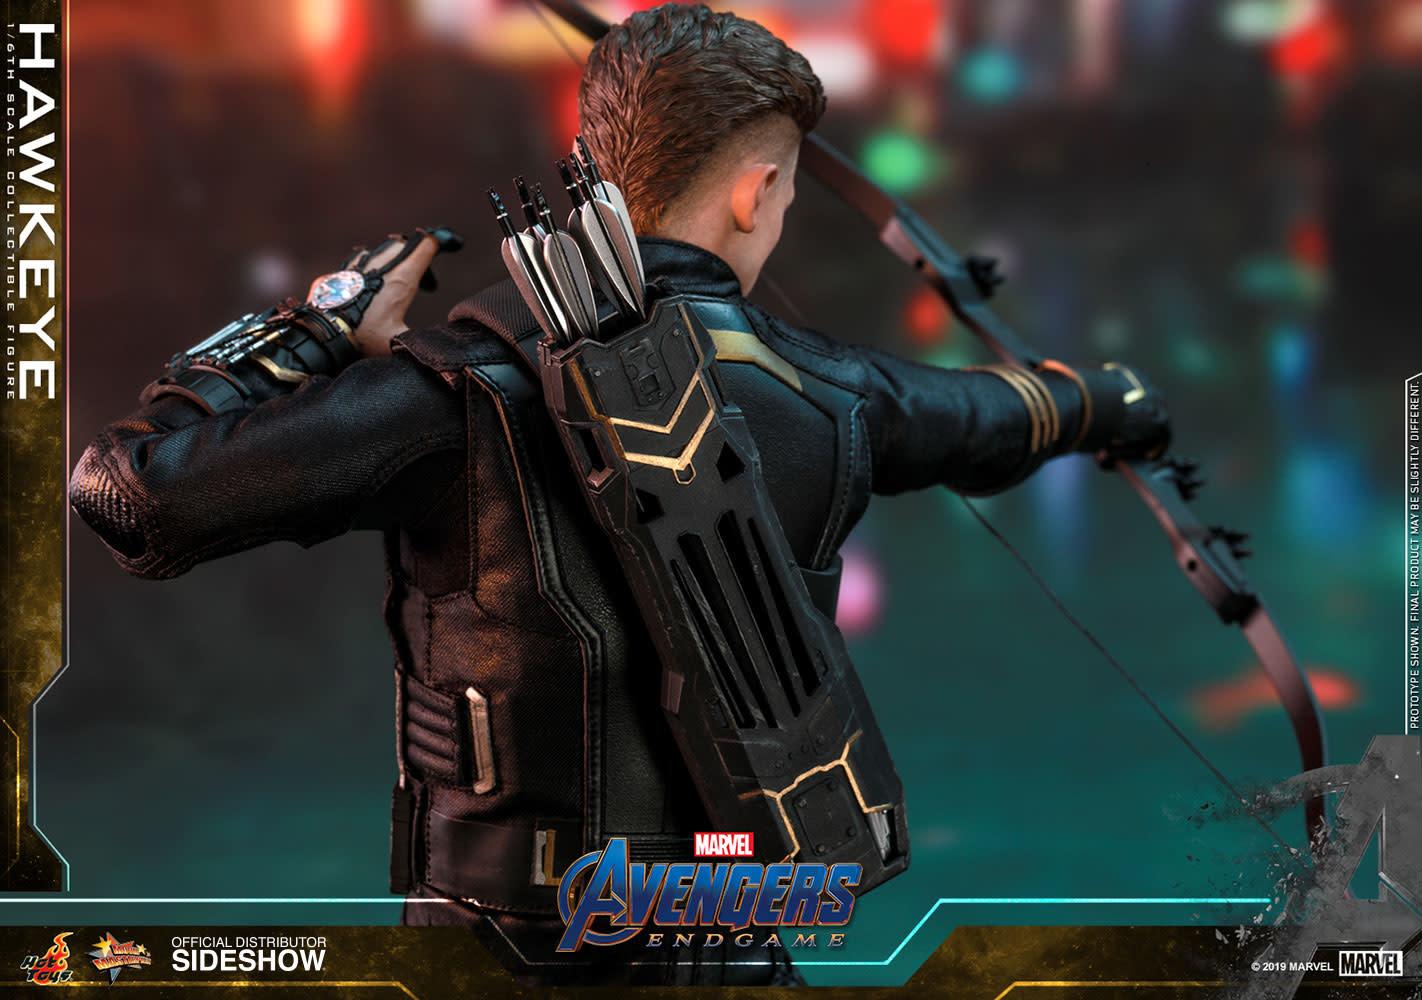 Hot toys Marvel: Avengers Endgame - Deluxe Hawkeye - 1:6 Scale Figure